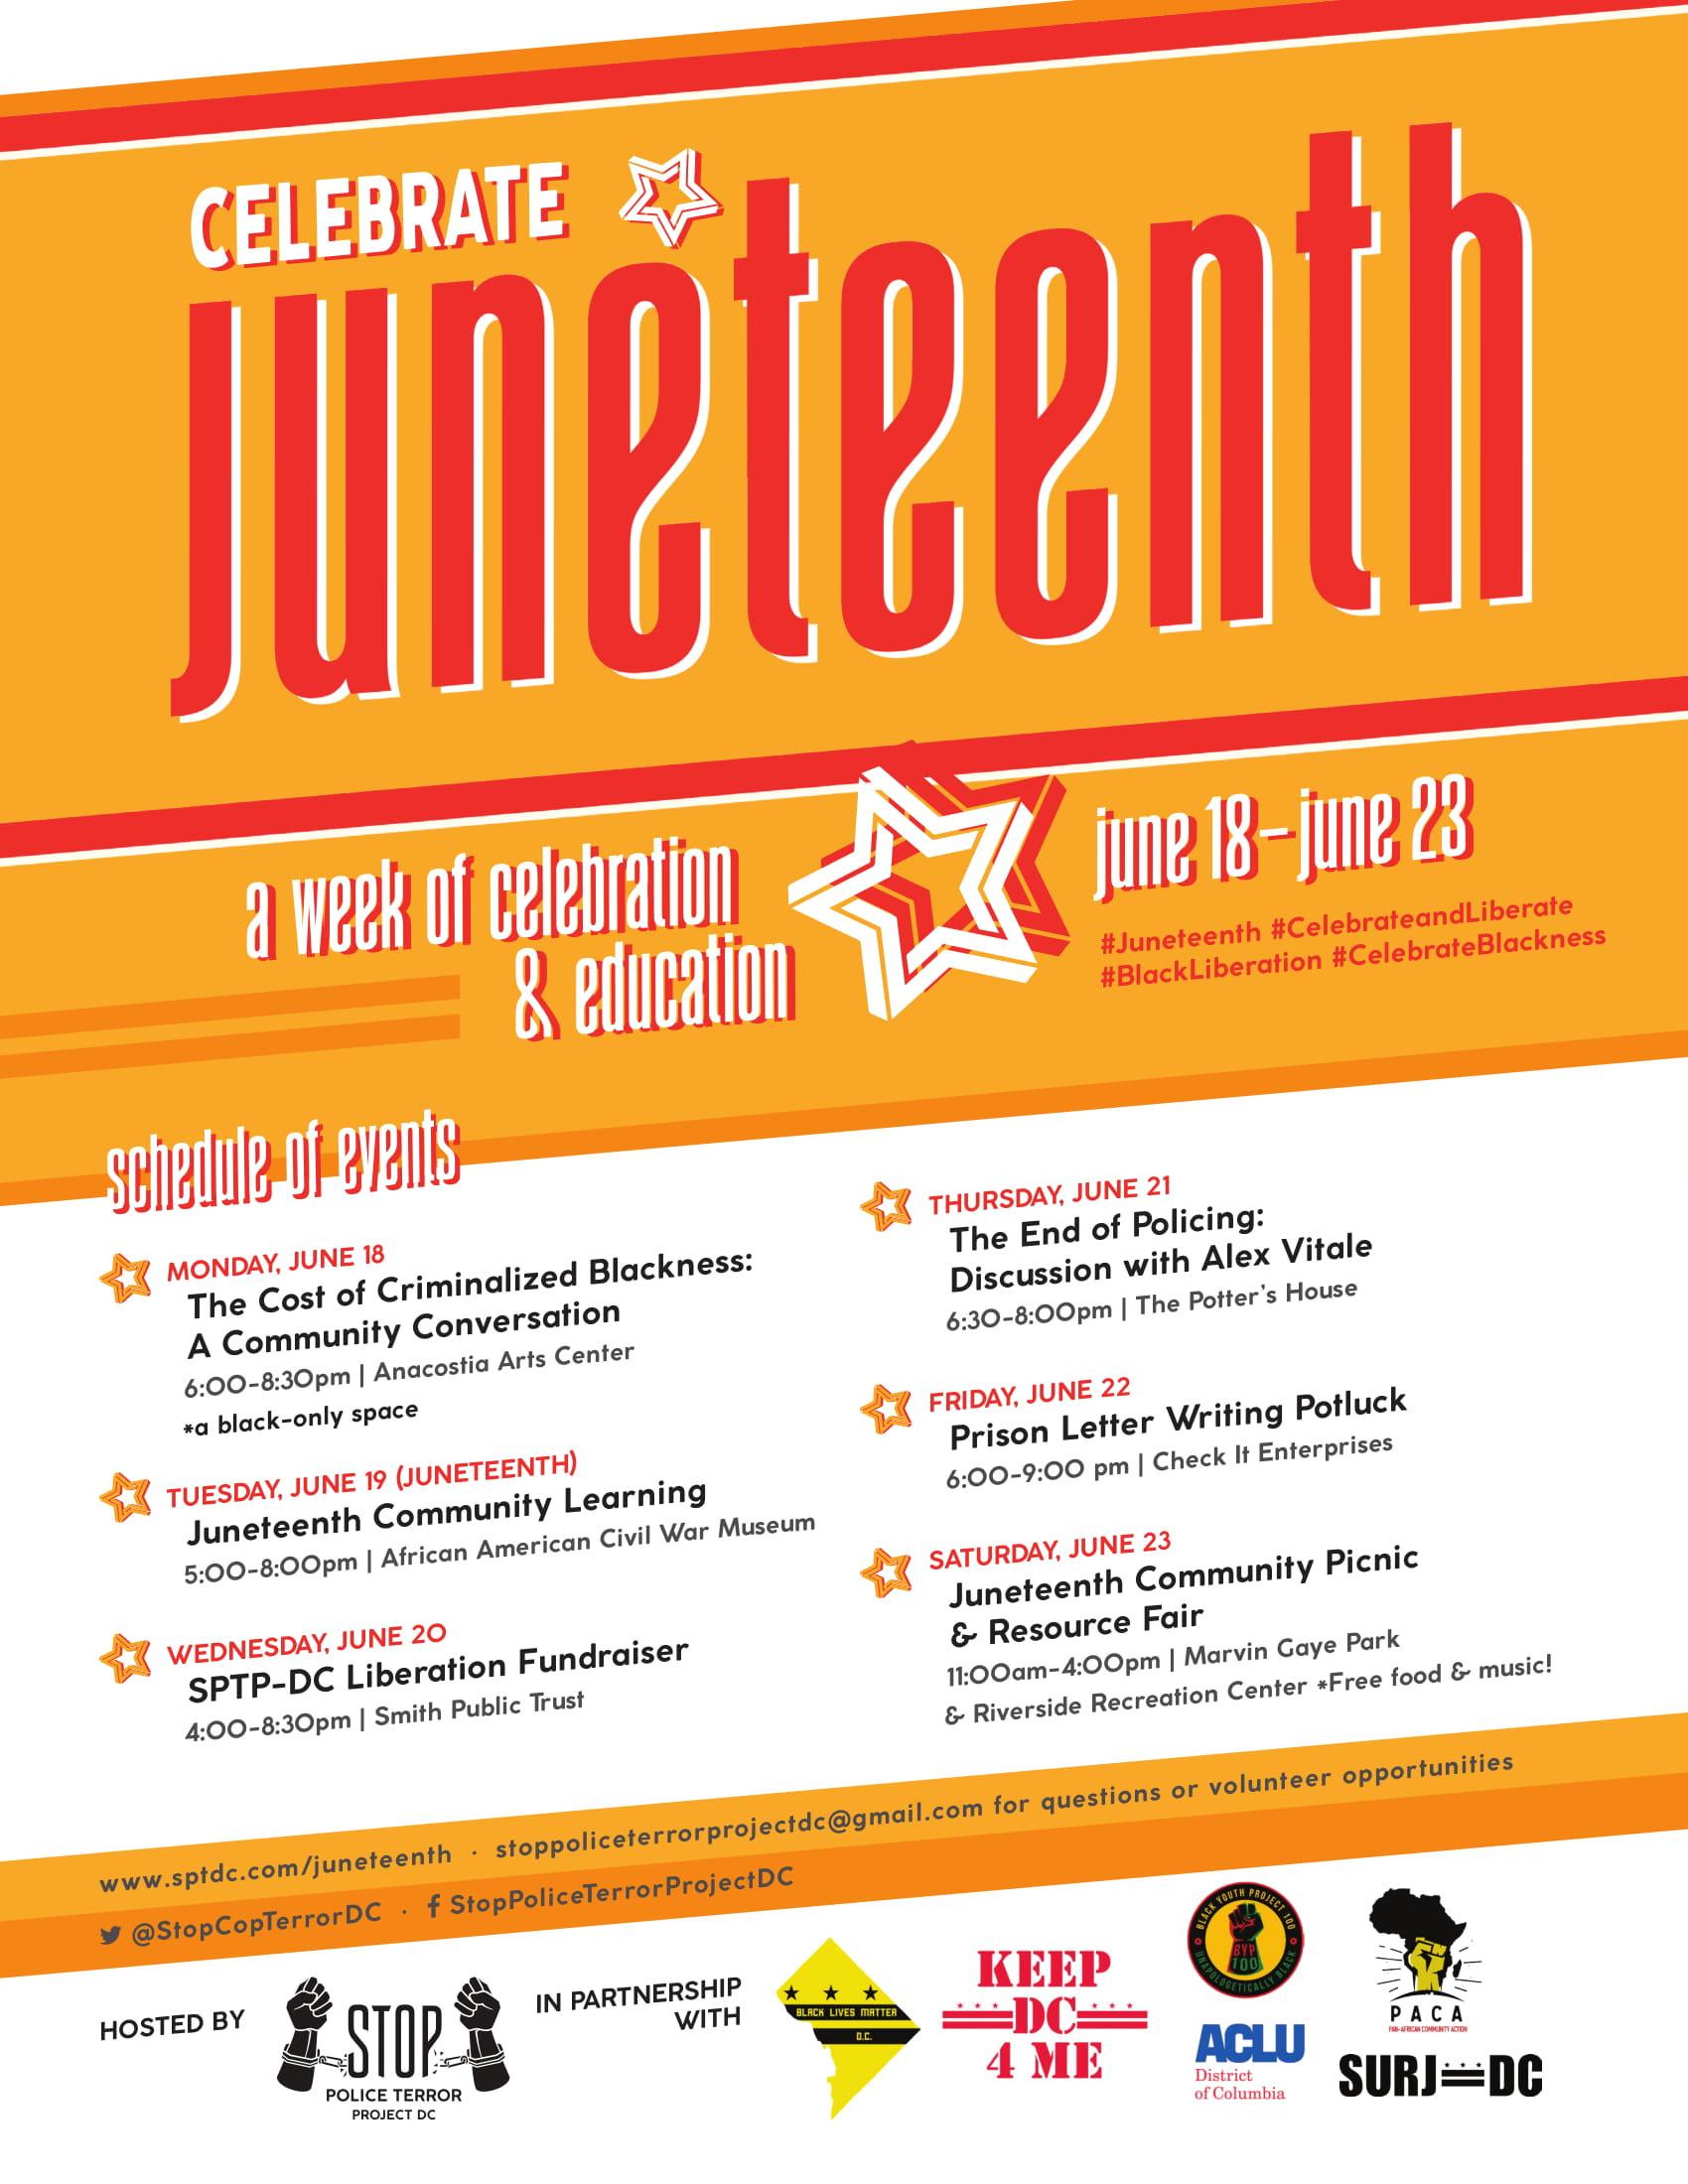 Copy of juneteenth-flyer-060118-1.jpg